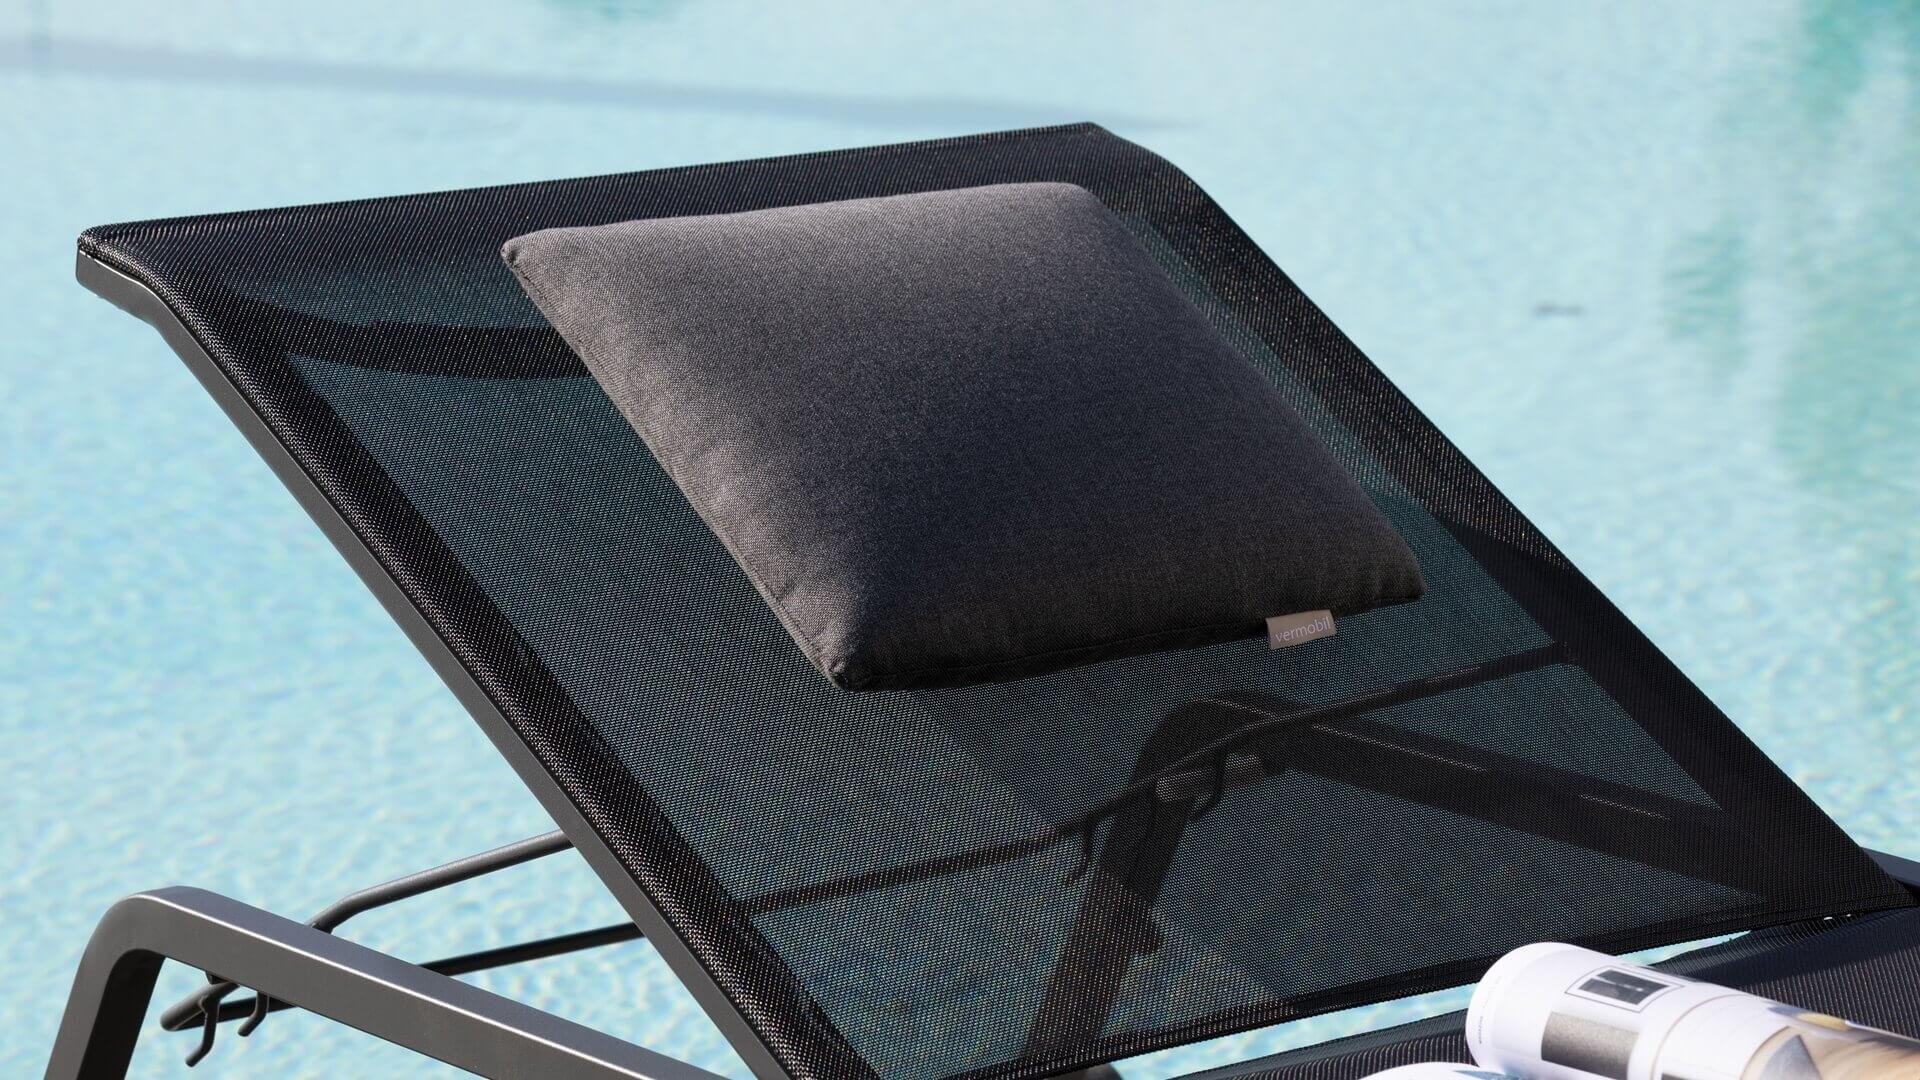 Relax a bordo piscina - Ischia (lettini da piscina)